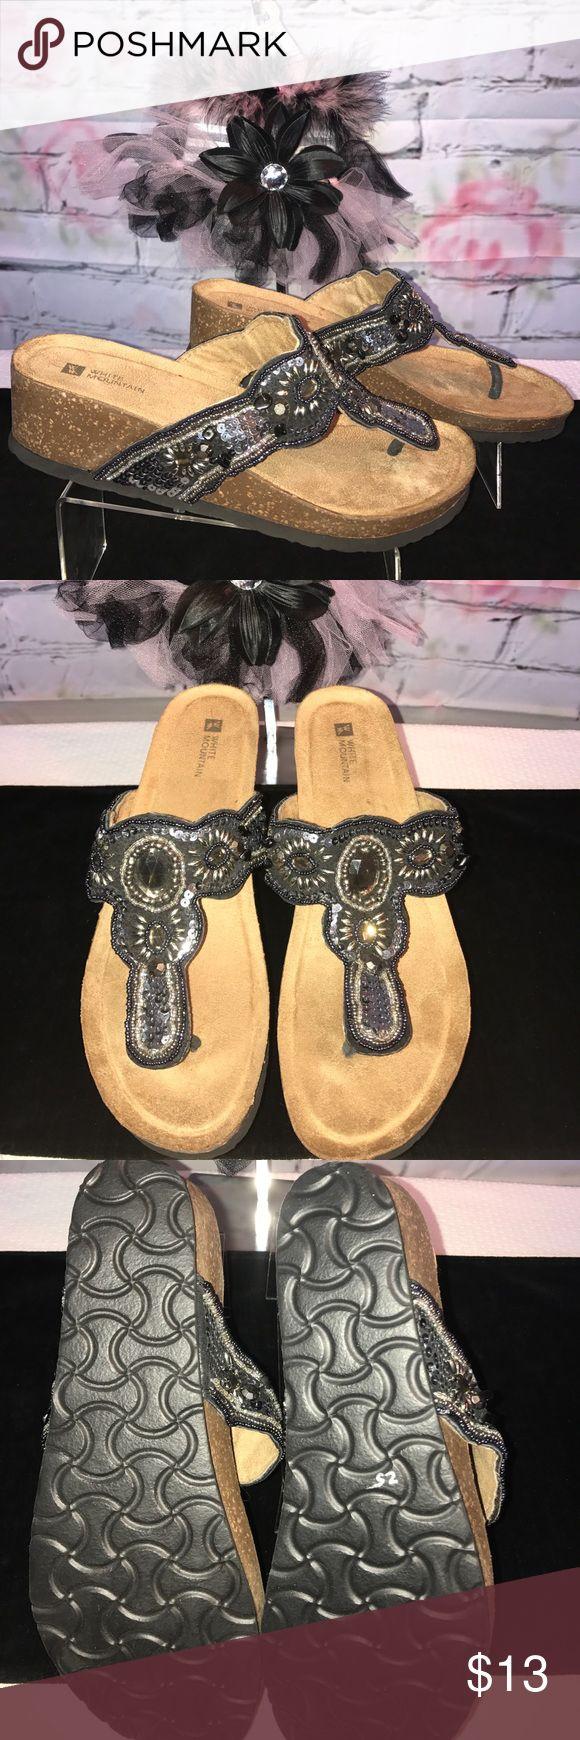 White Mountain Flip Flop size 10 NWOT Cute pair of bling flip-flops by White Mountain size 10 ❤️😊🐾🐾 White Mountain Shoes Sandals